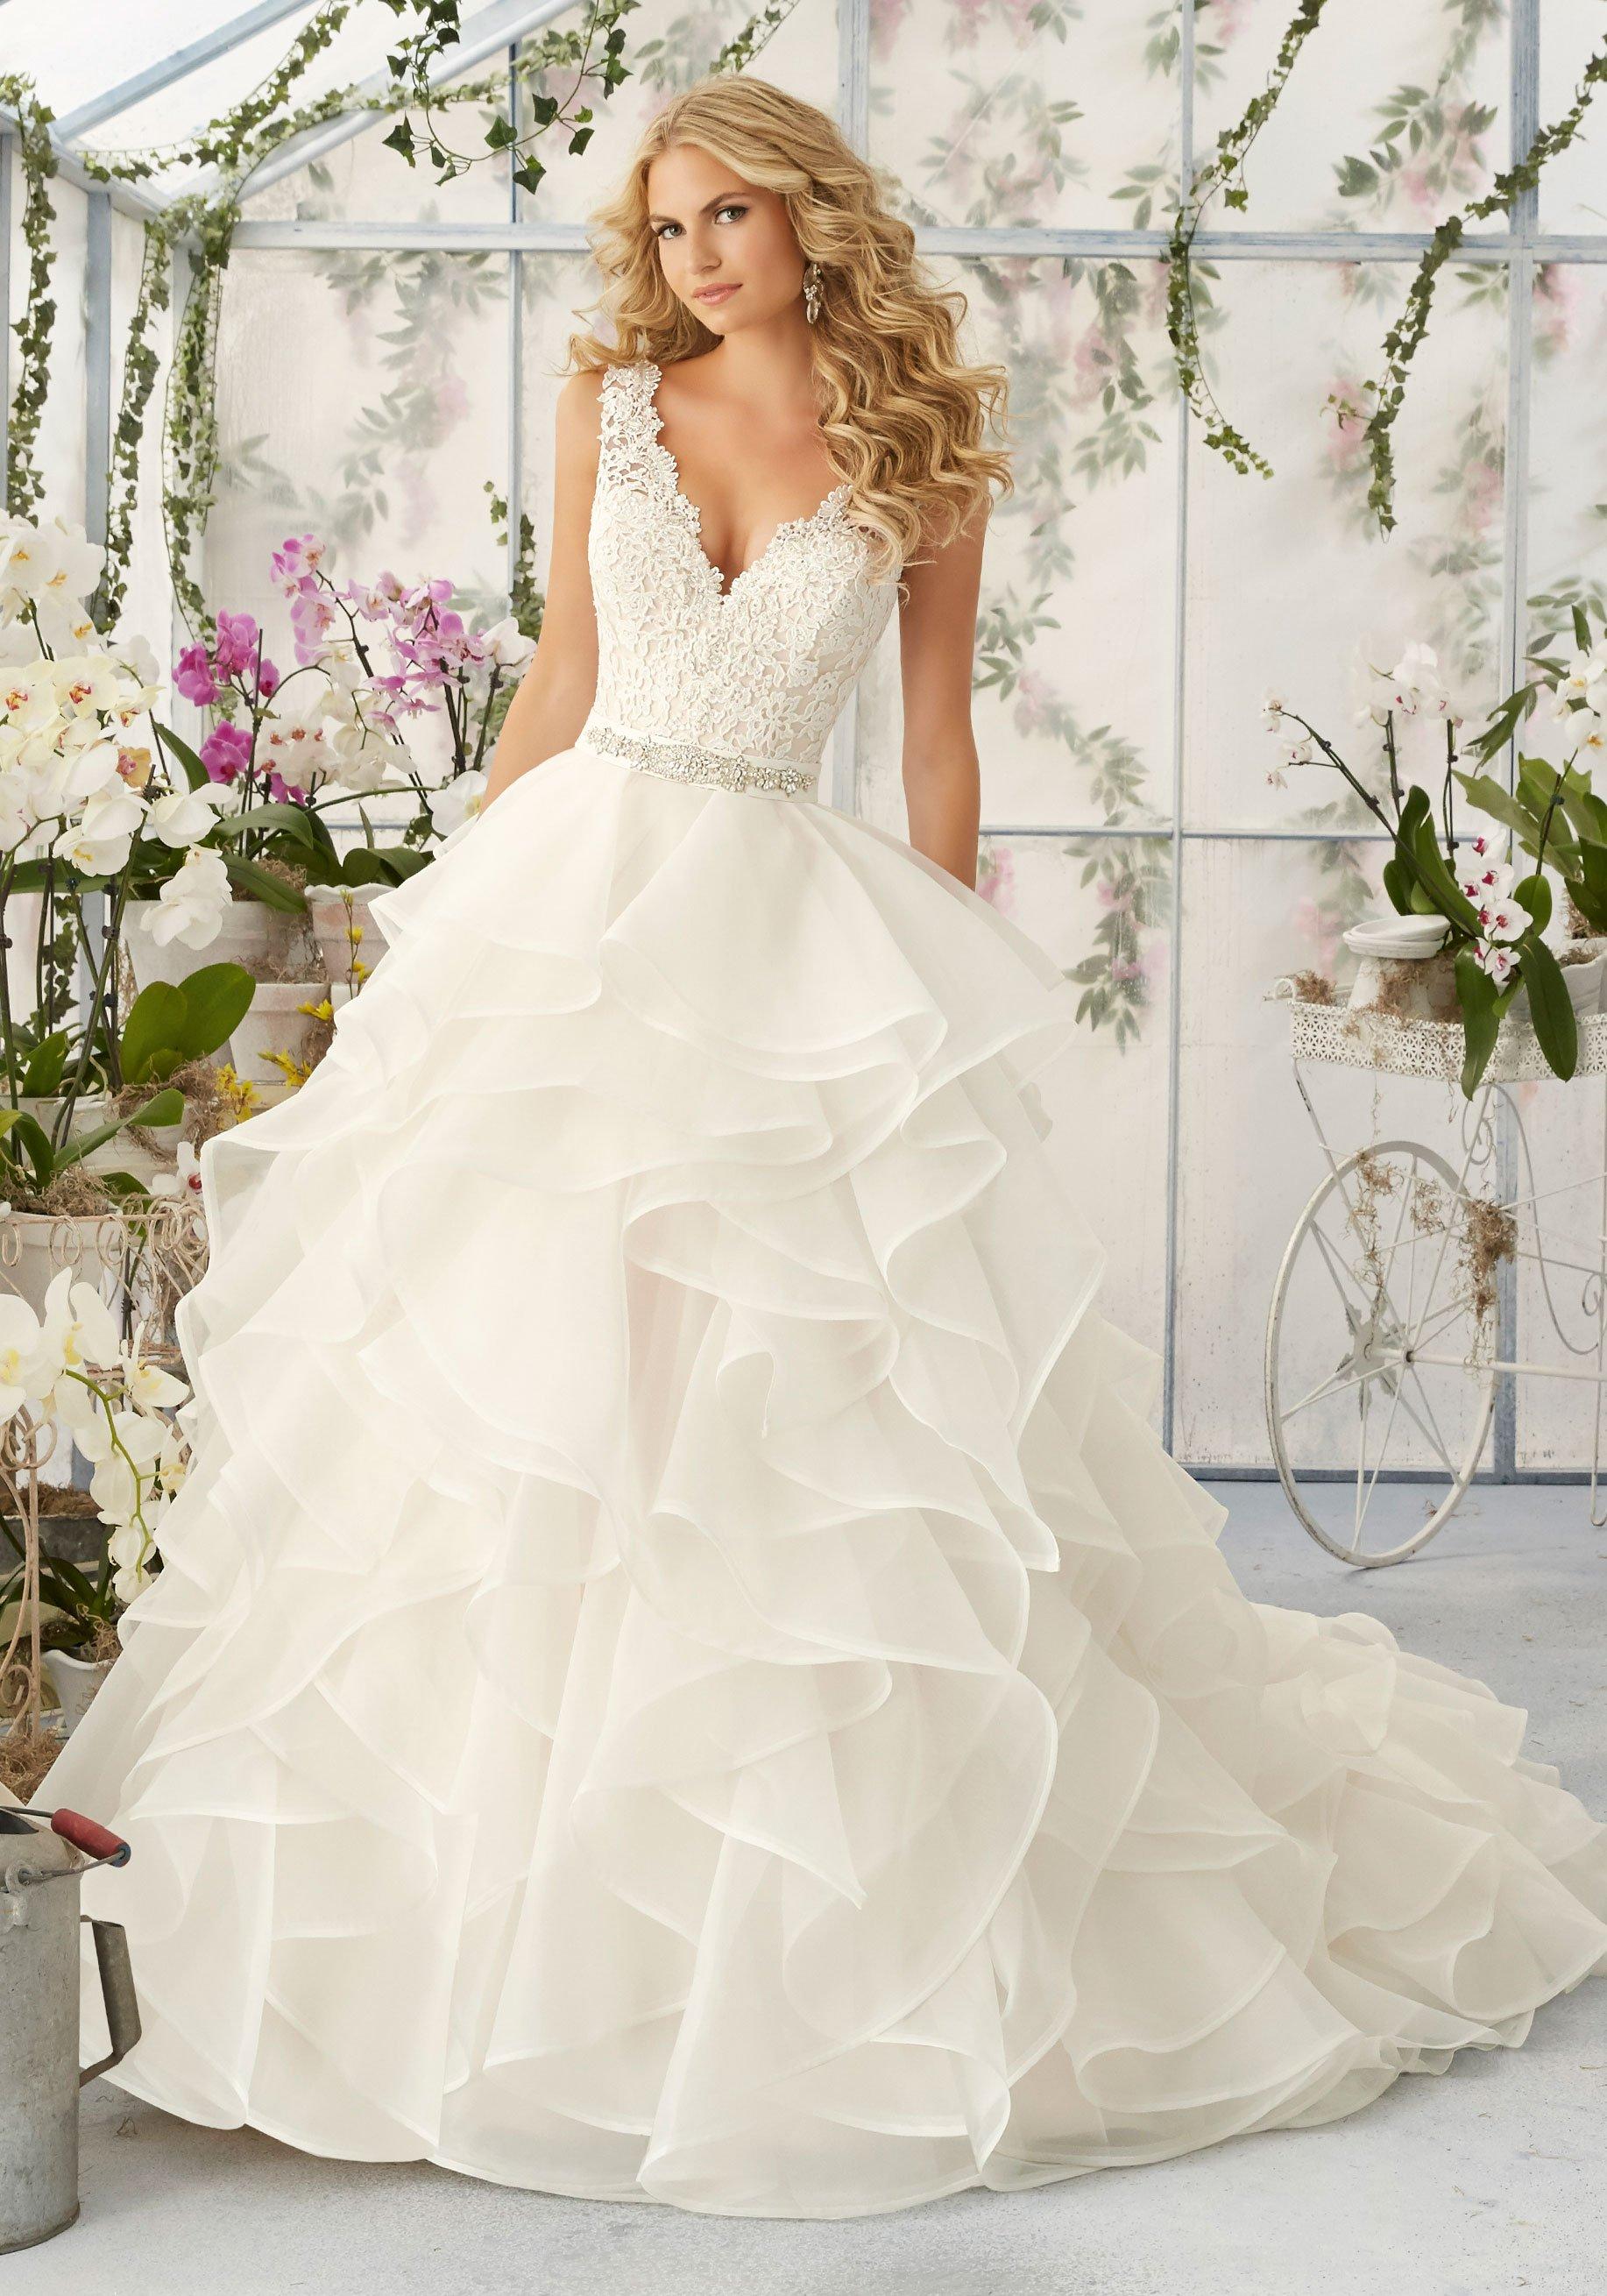 a35713a7a7f7 Mori lee 2805 wedding dress - Catrinas Bridal